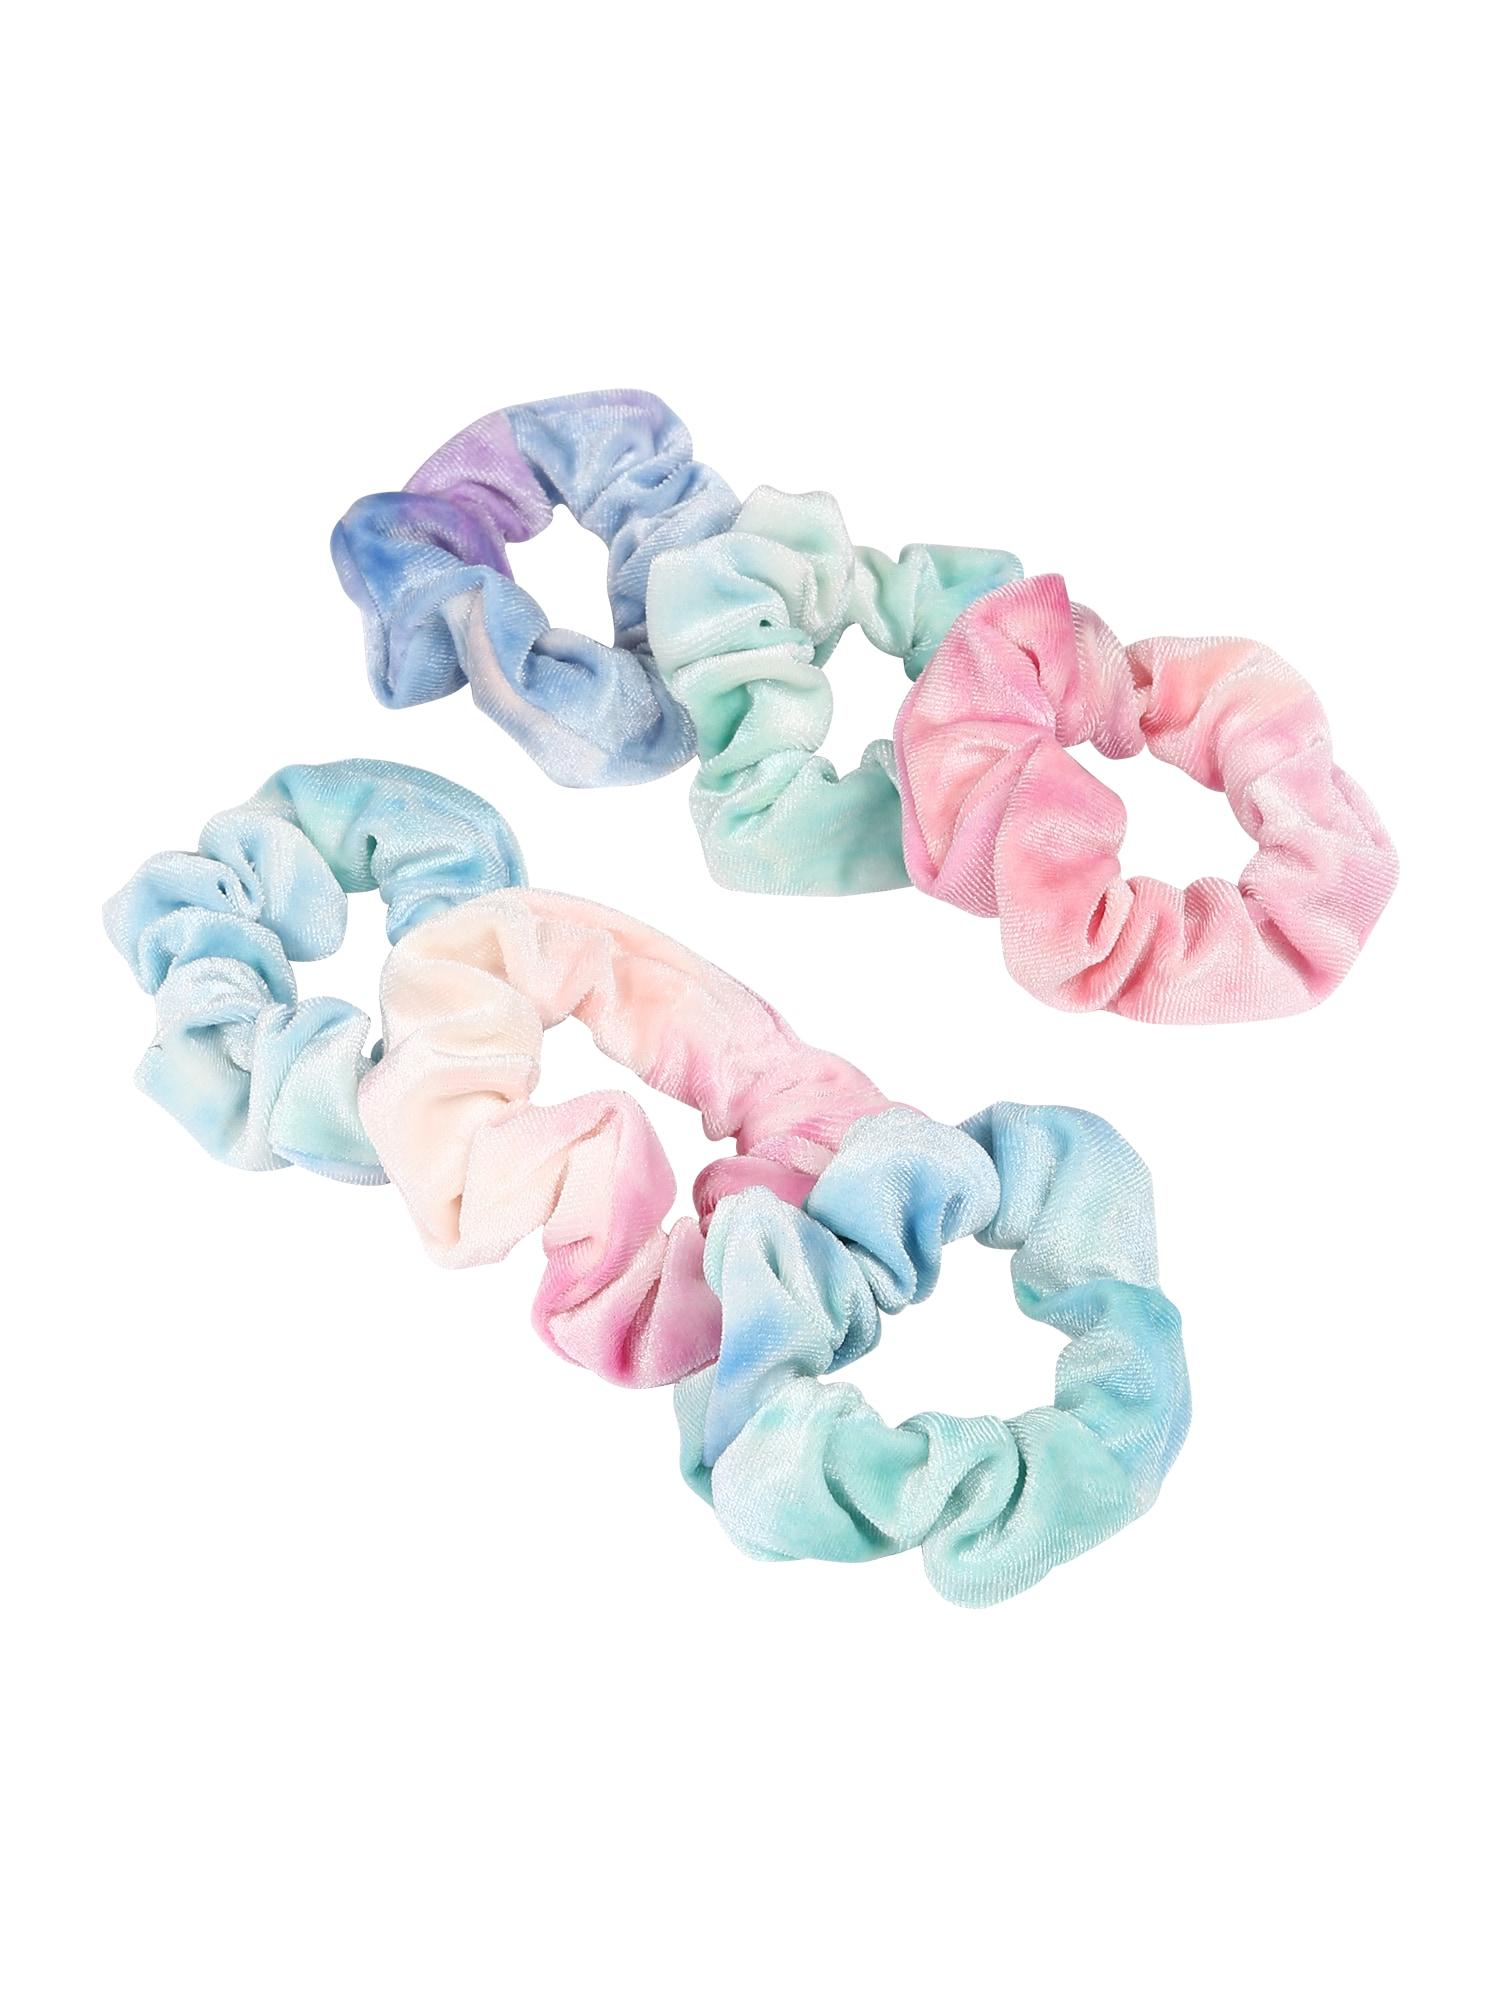 Gina Tricot Mini Šperky do vlasů  mix barev